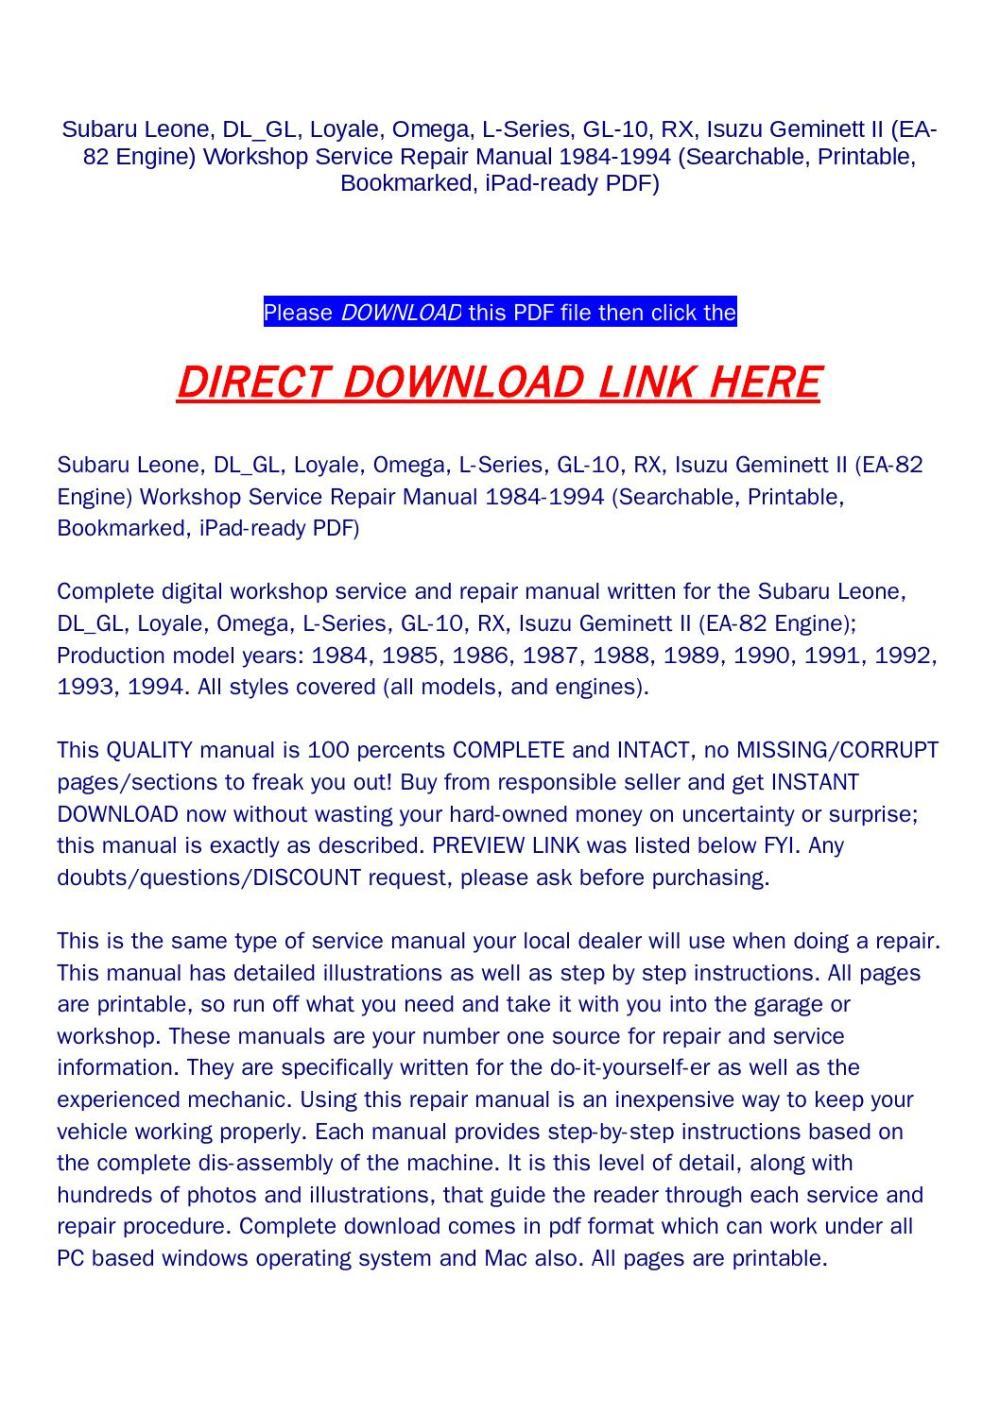 medium resolution of subaru leone dl gl loyale omega l series gl 10